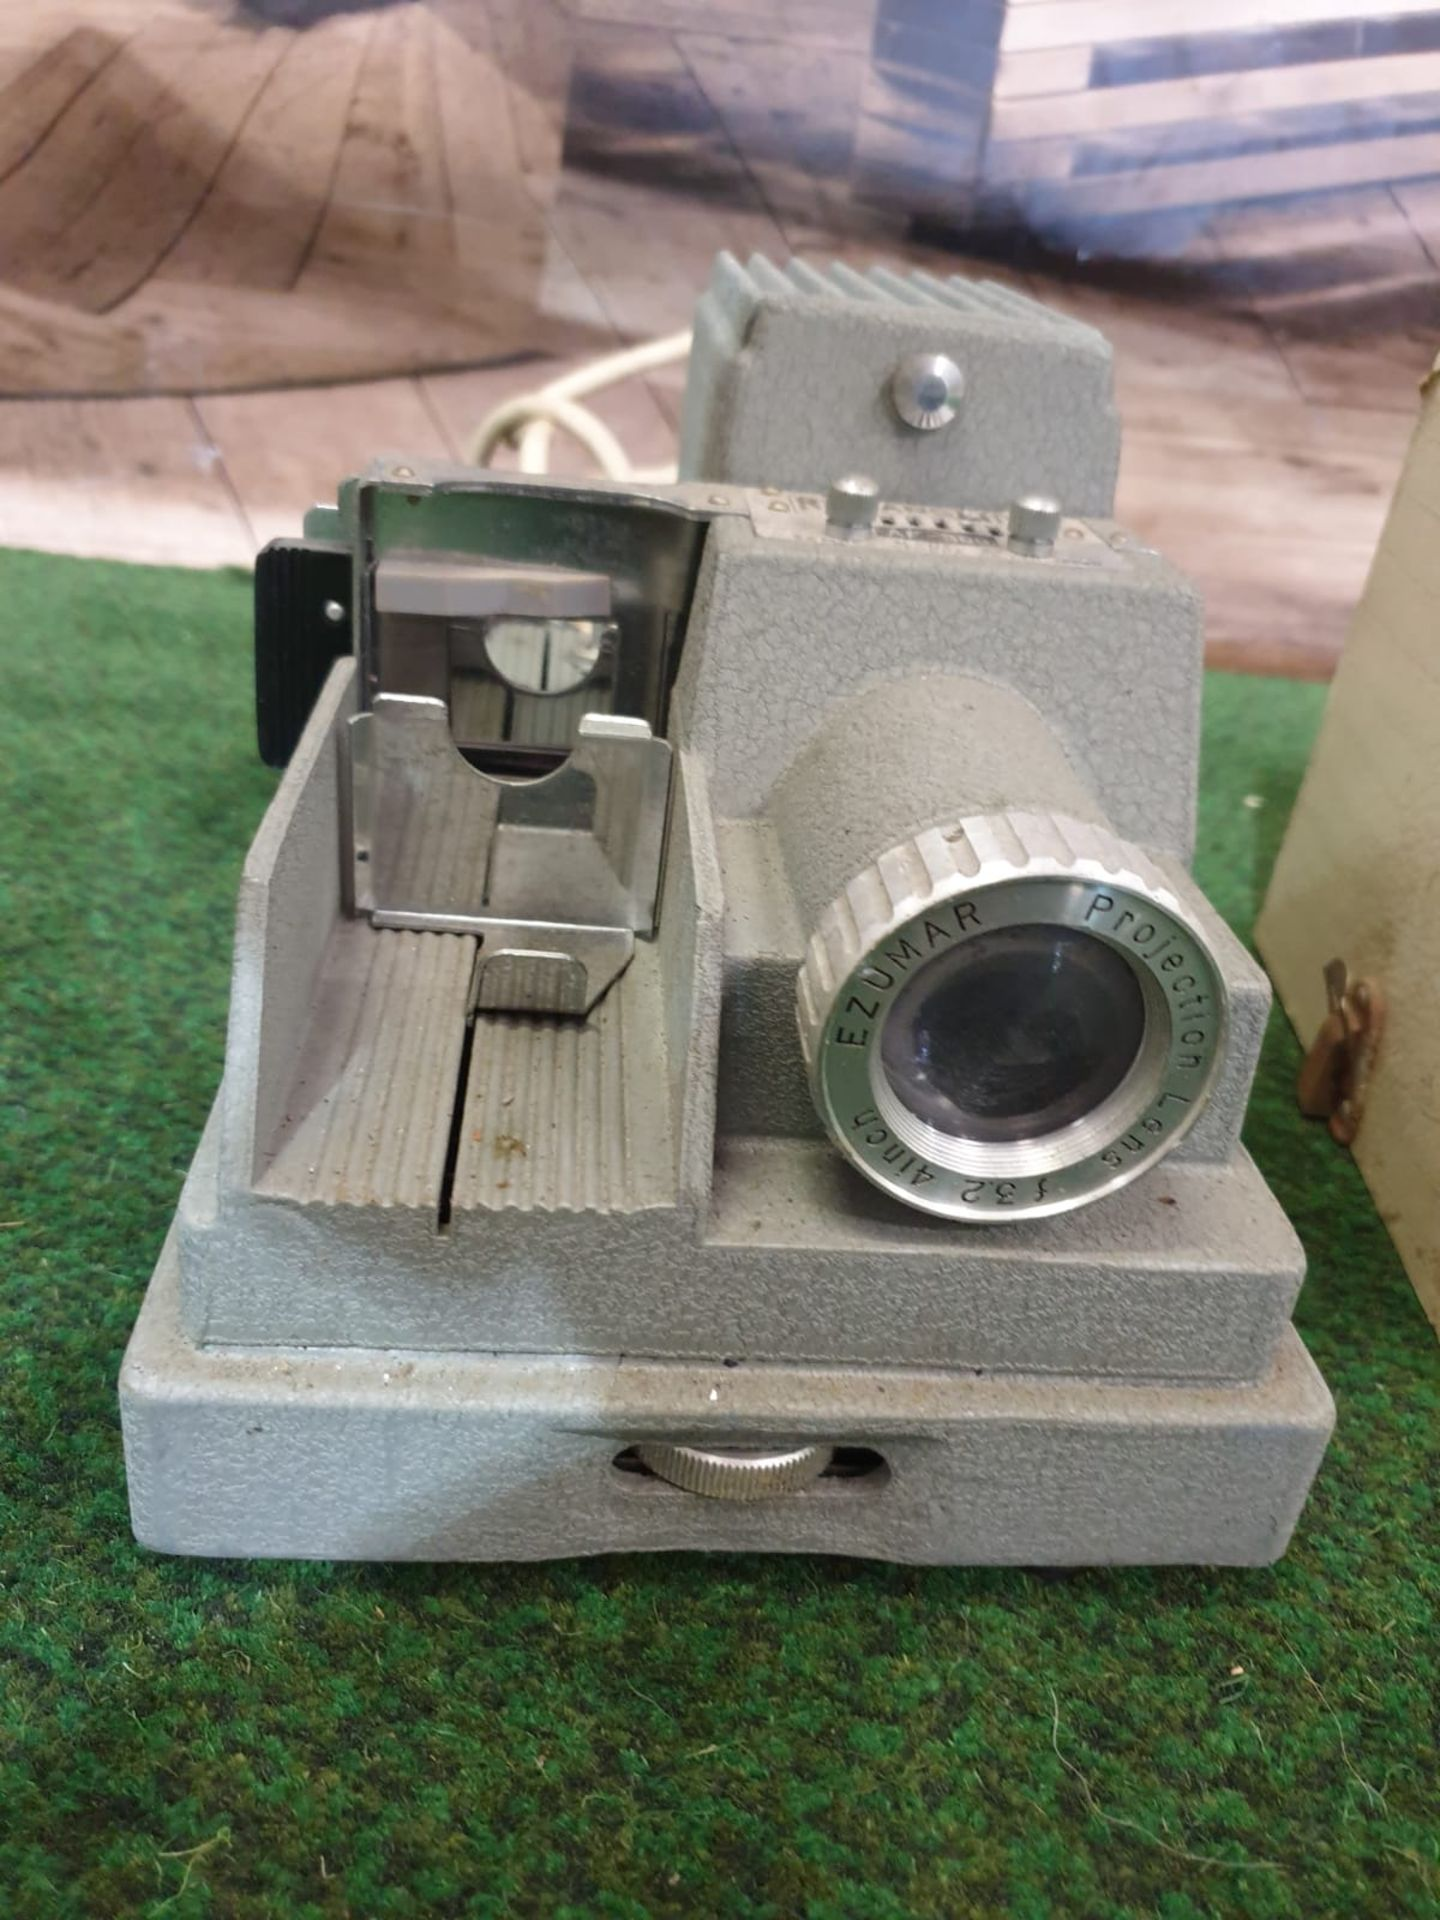 Samoca Camera AF-300 Projector Roman Slides Projector Screen 26 x 18 x 16cm Dates to 1955- 1956 - Image 3 of 4